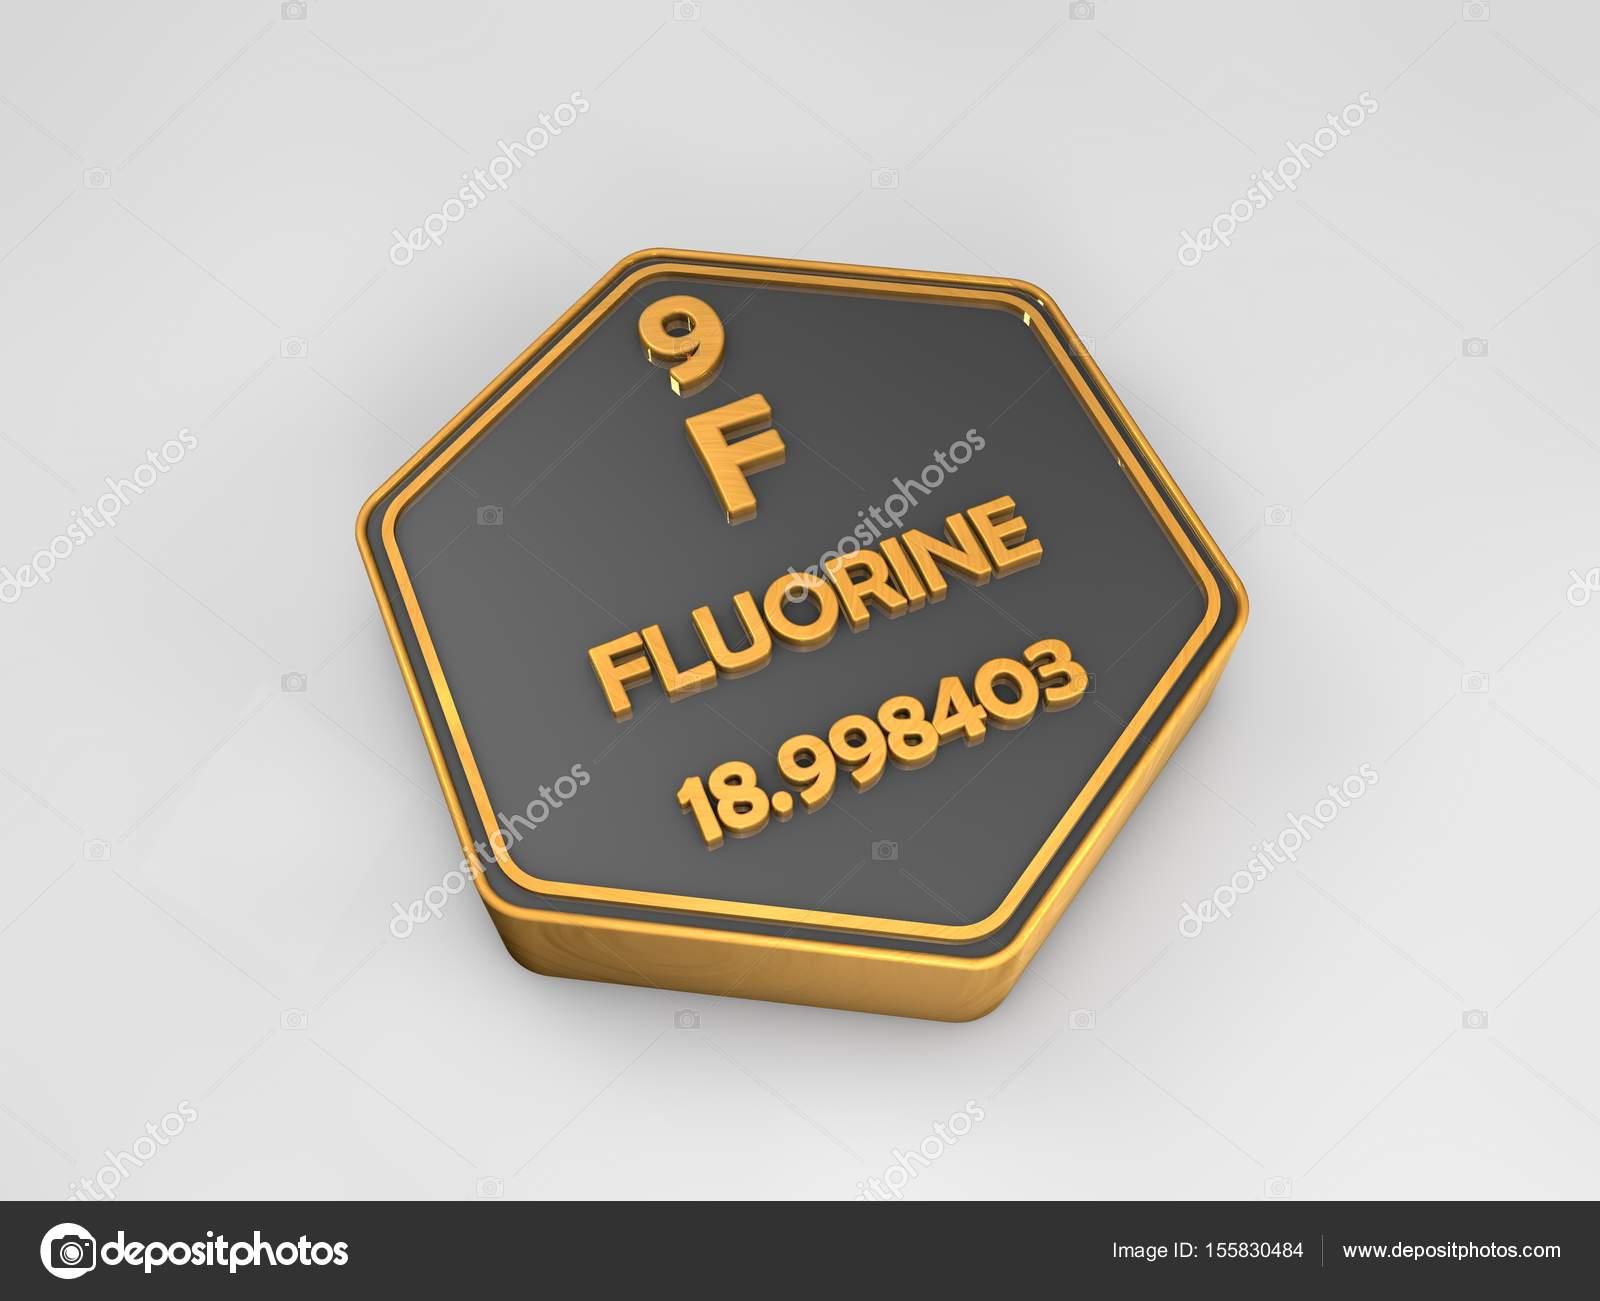 Ilustracin 3d de forma hexagonal de tabla peridica de elementos ilustracin 3d de forma hexagonal de tabla peridica de elementos qumicos de flor f urtaz Choice Image